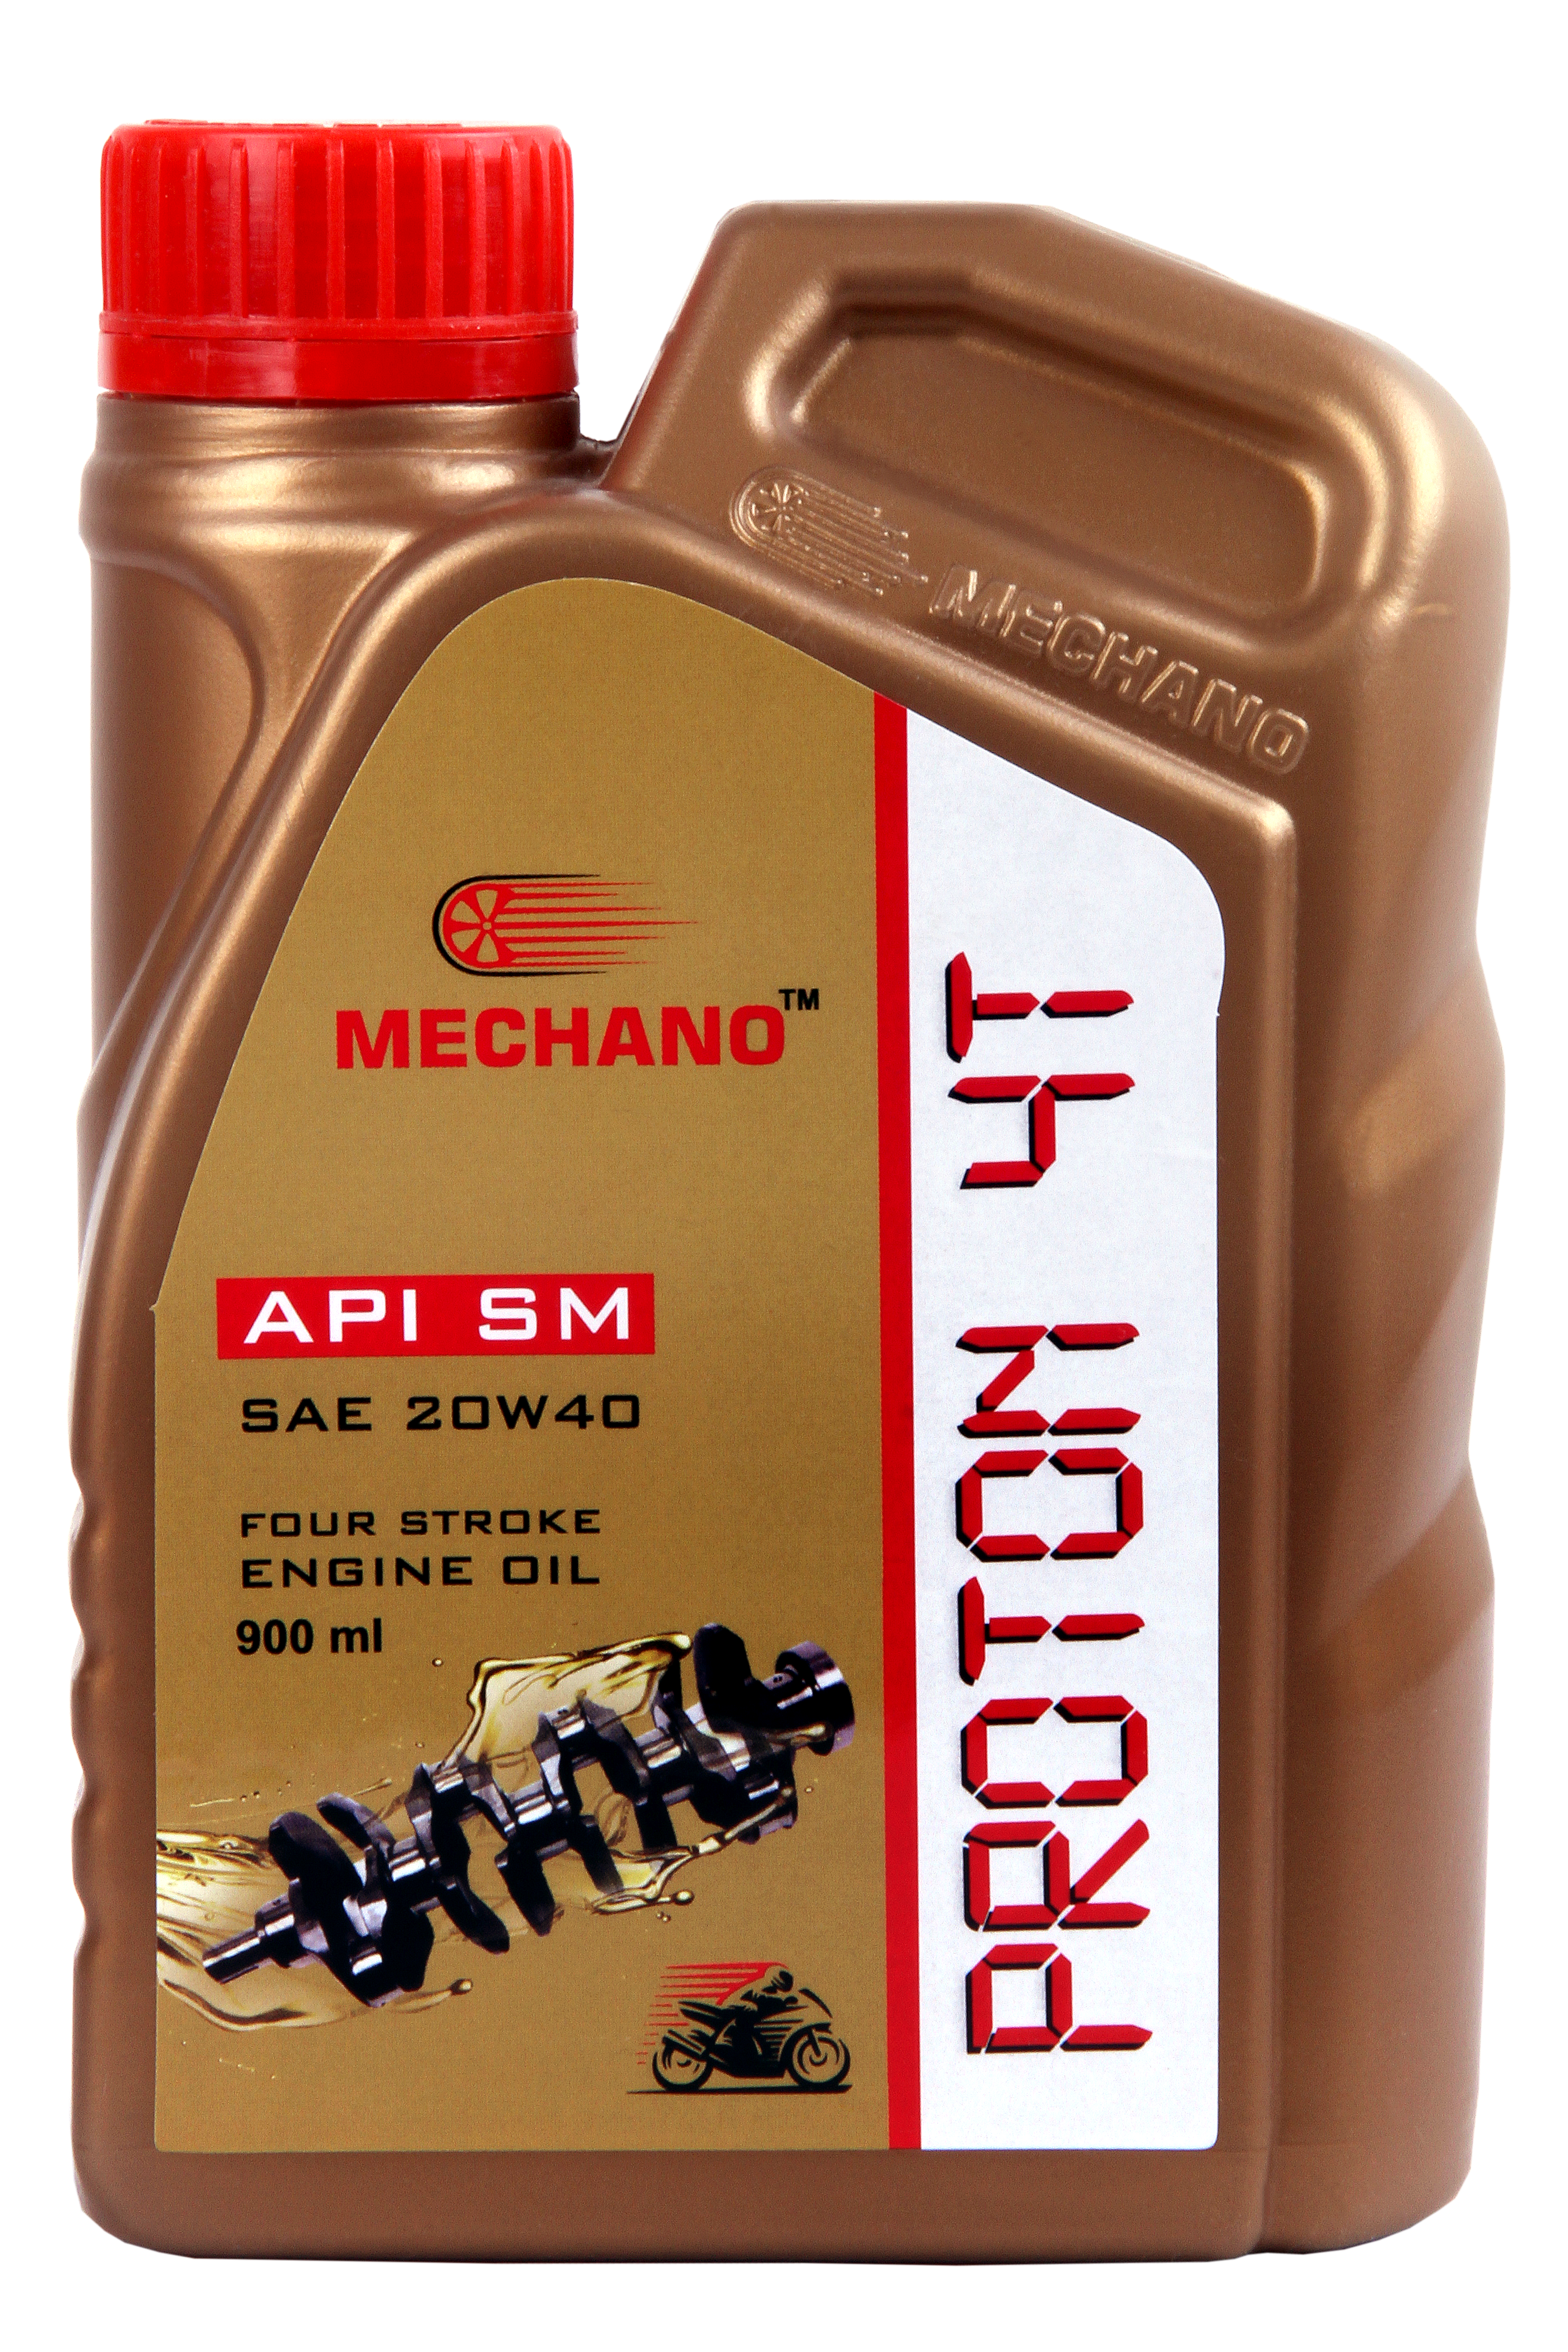 Mechano Proton 4T 20W40 API SM